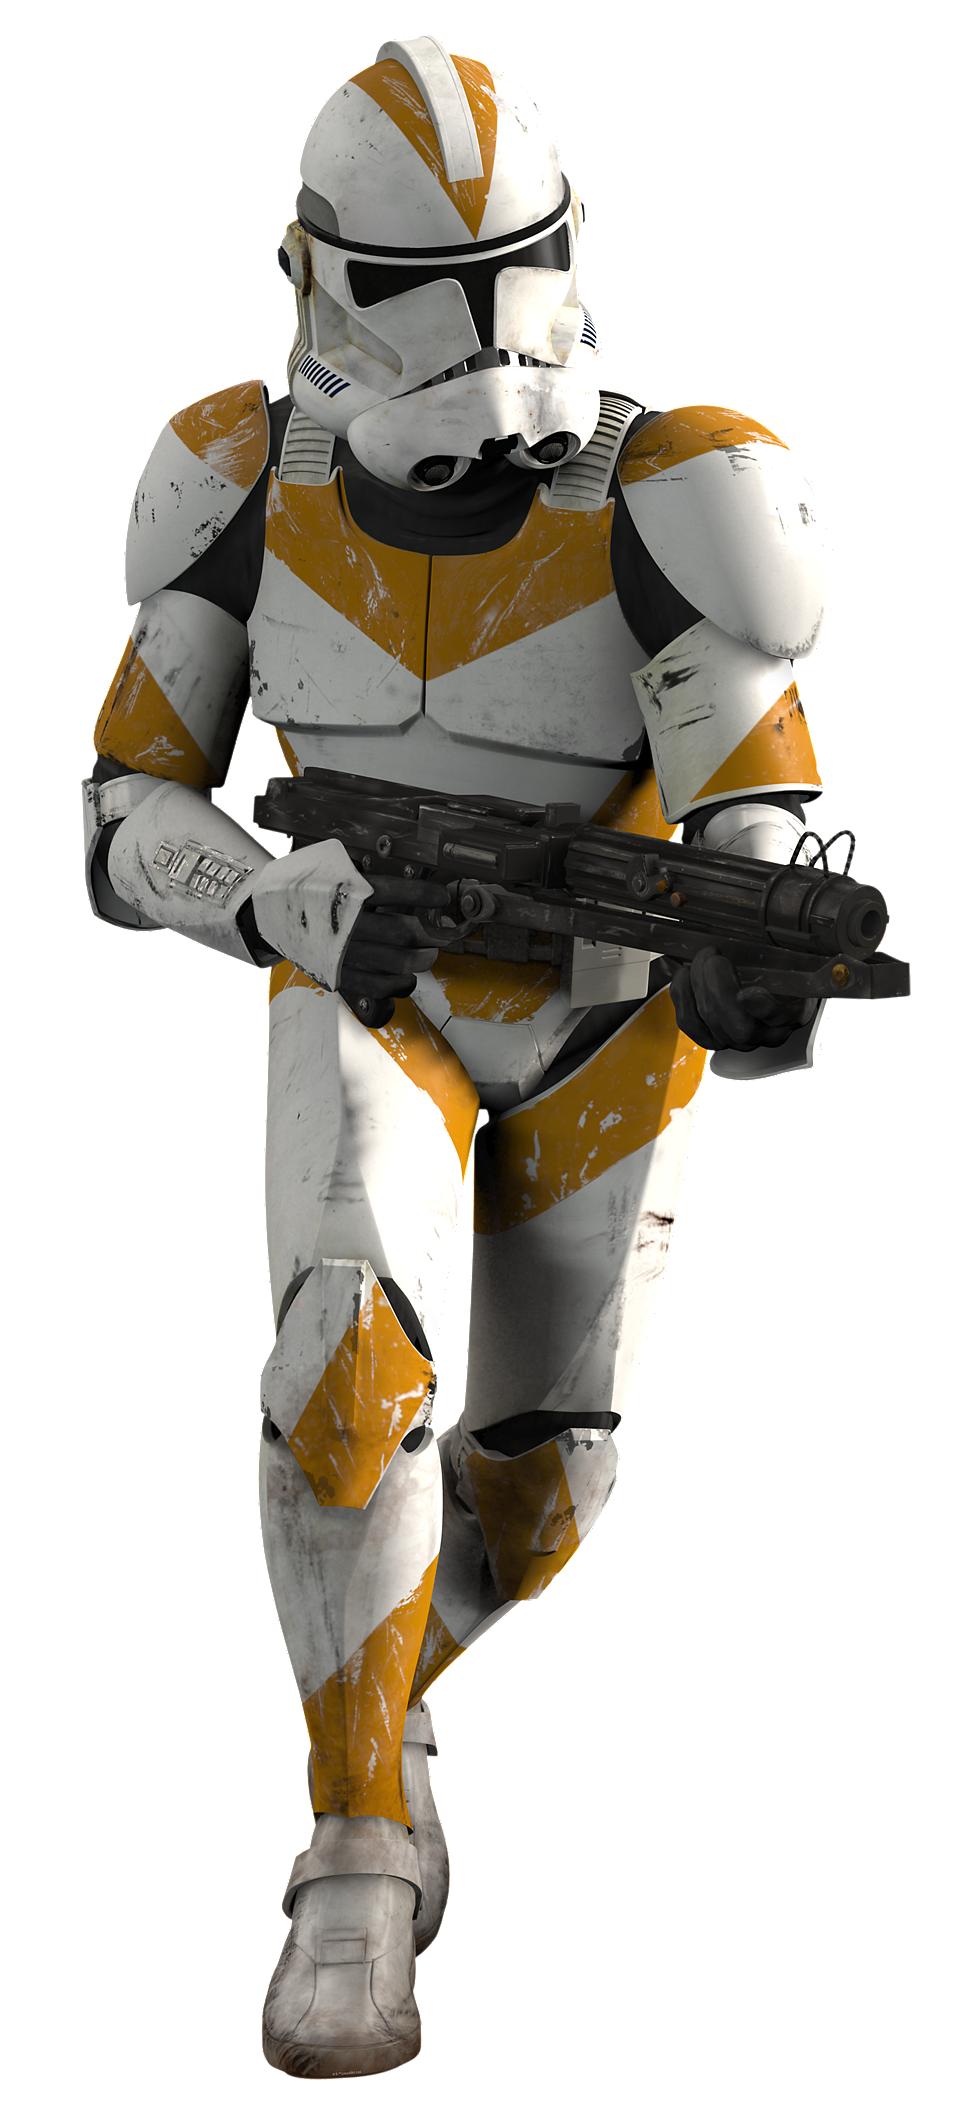 212th Attack Battalion Star Wars Images Star Wars Rpg Star Wars Clone Wars